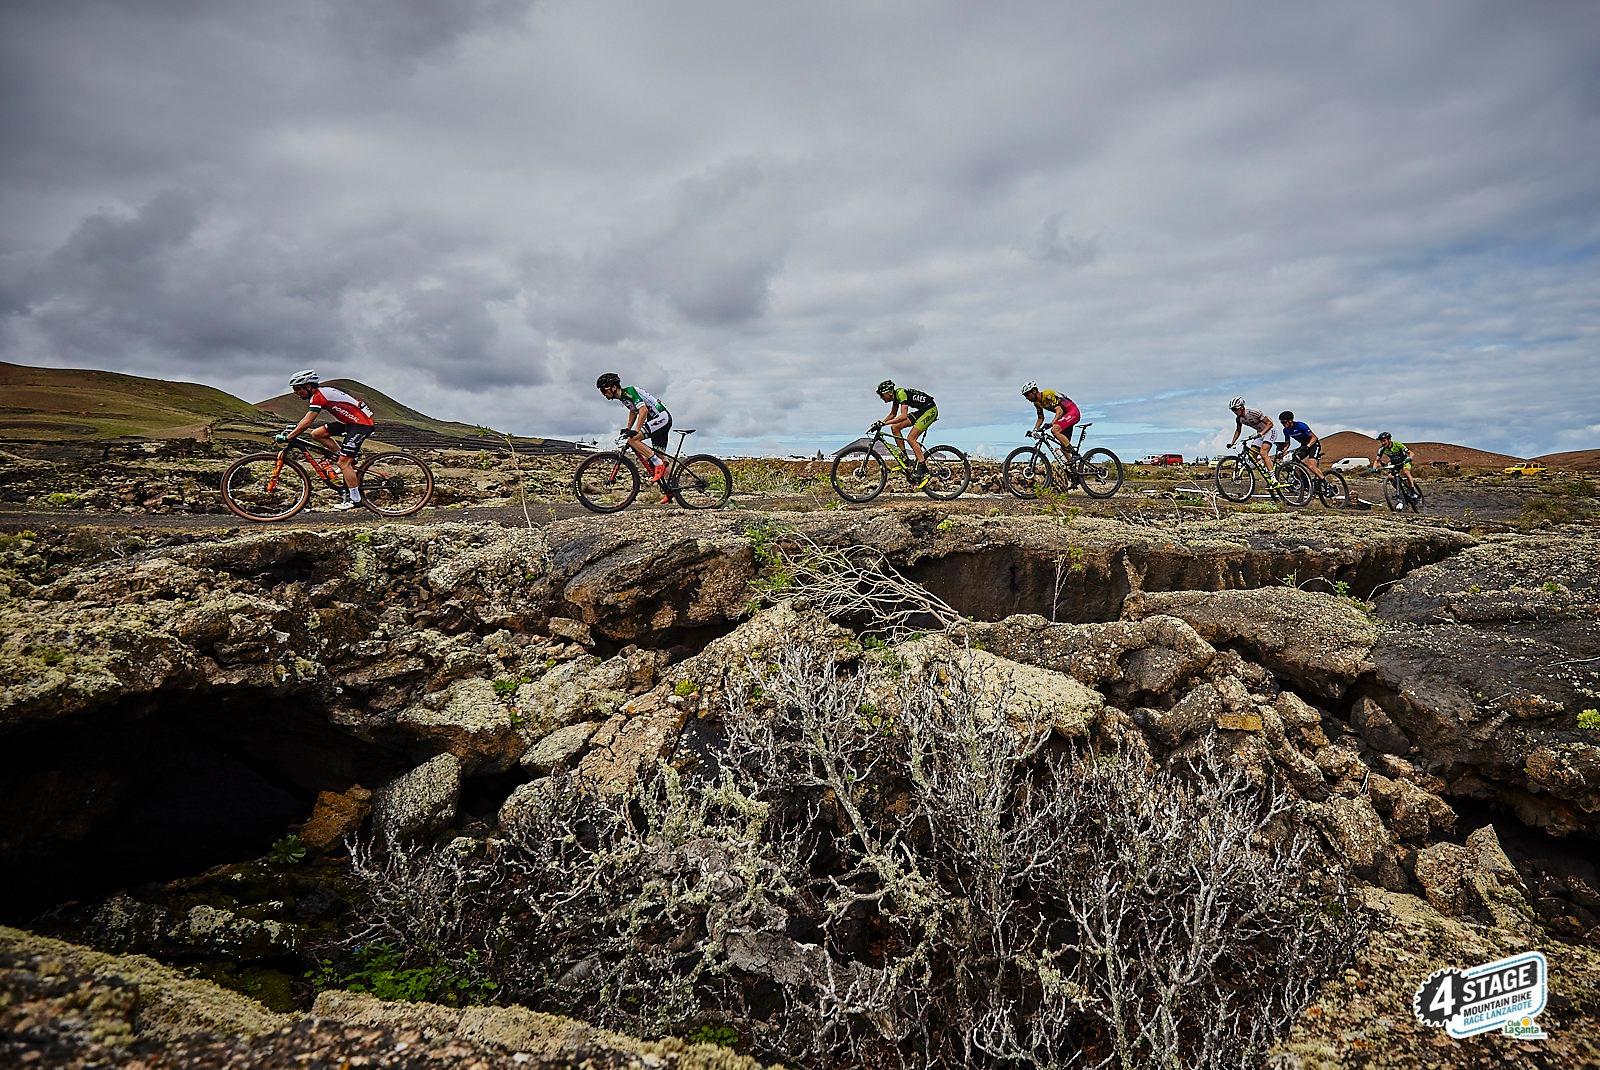 Bartlomiej en Pintaric winnen eerste rit 4stage MTB Lanzarote